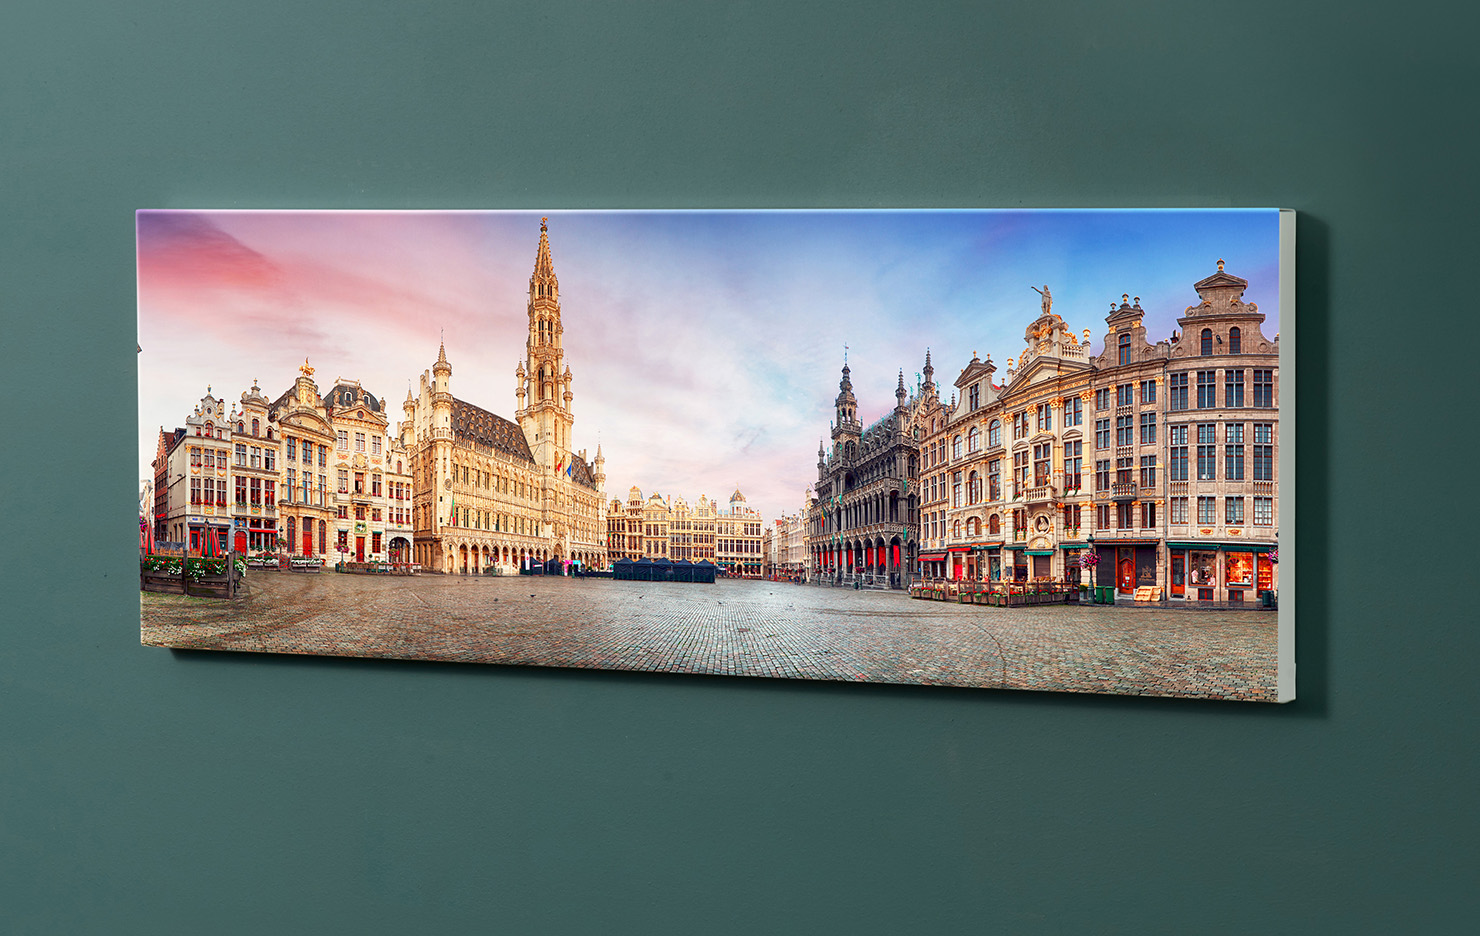 Magnettafel NOTIZ 90x30cm Motiv-Pinnwand M151 Brüssel